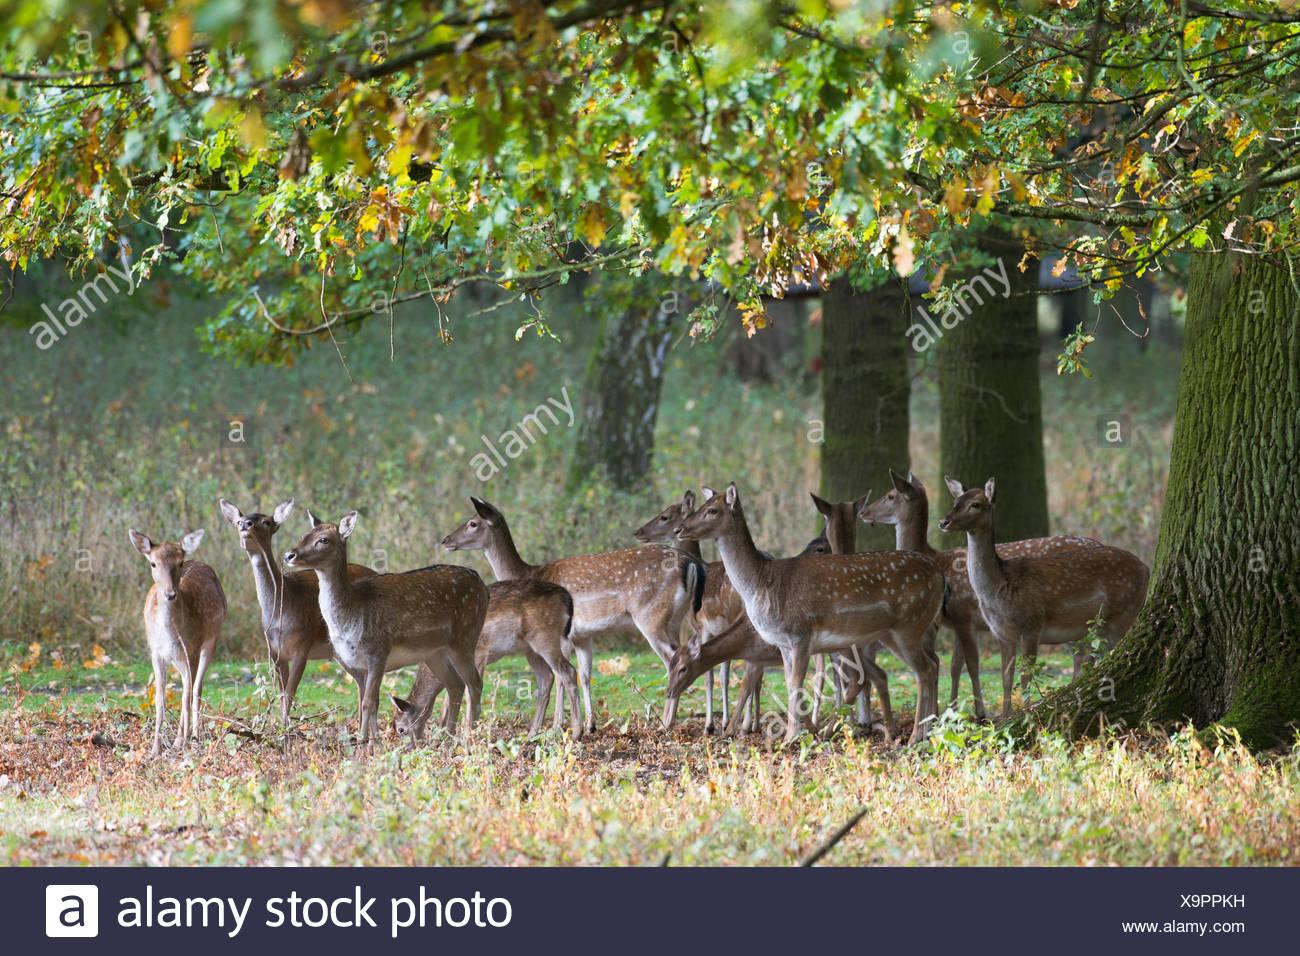 Fallow deer (Dama dama), herd under oak trees, captive, Niedersachsen, Germany - Stock Image